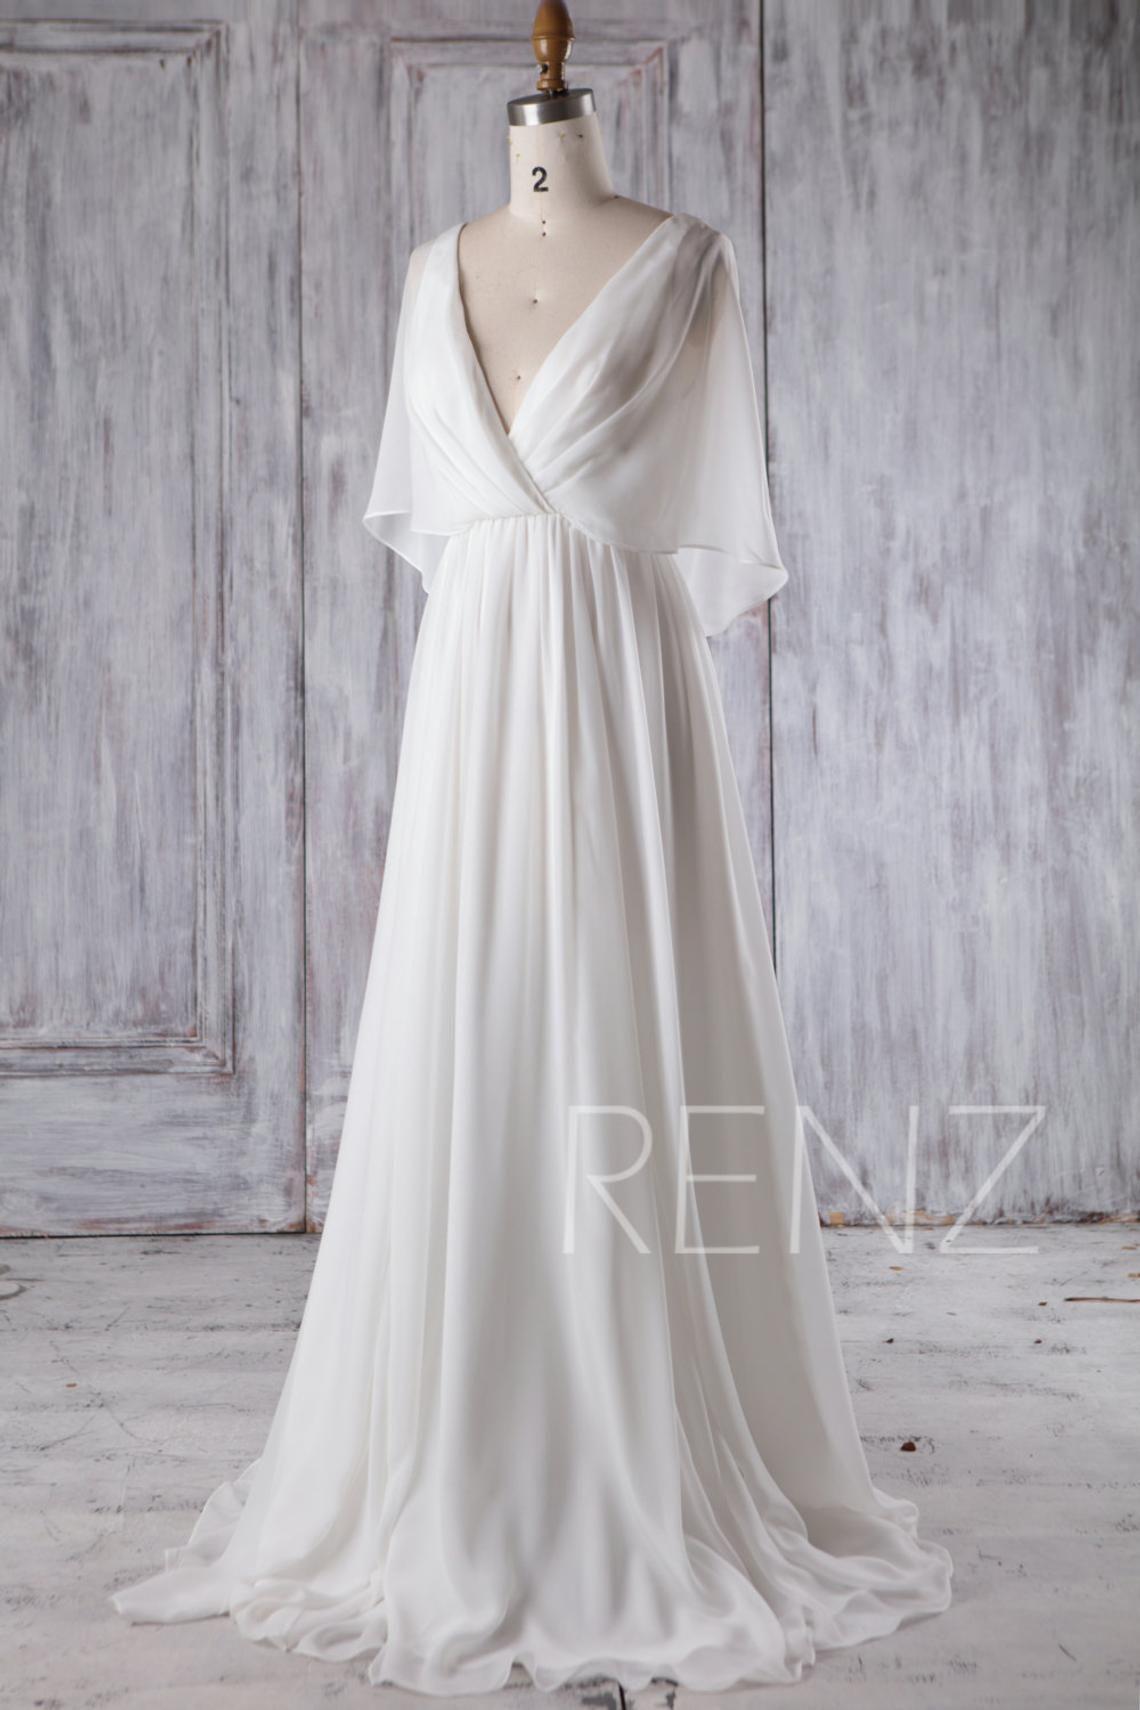 Beach wedding dress white chiffon evening dress long